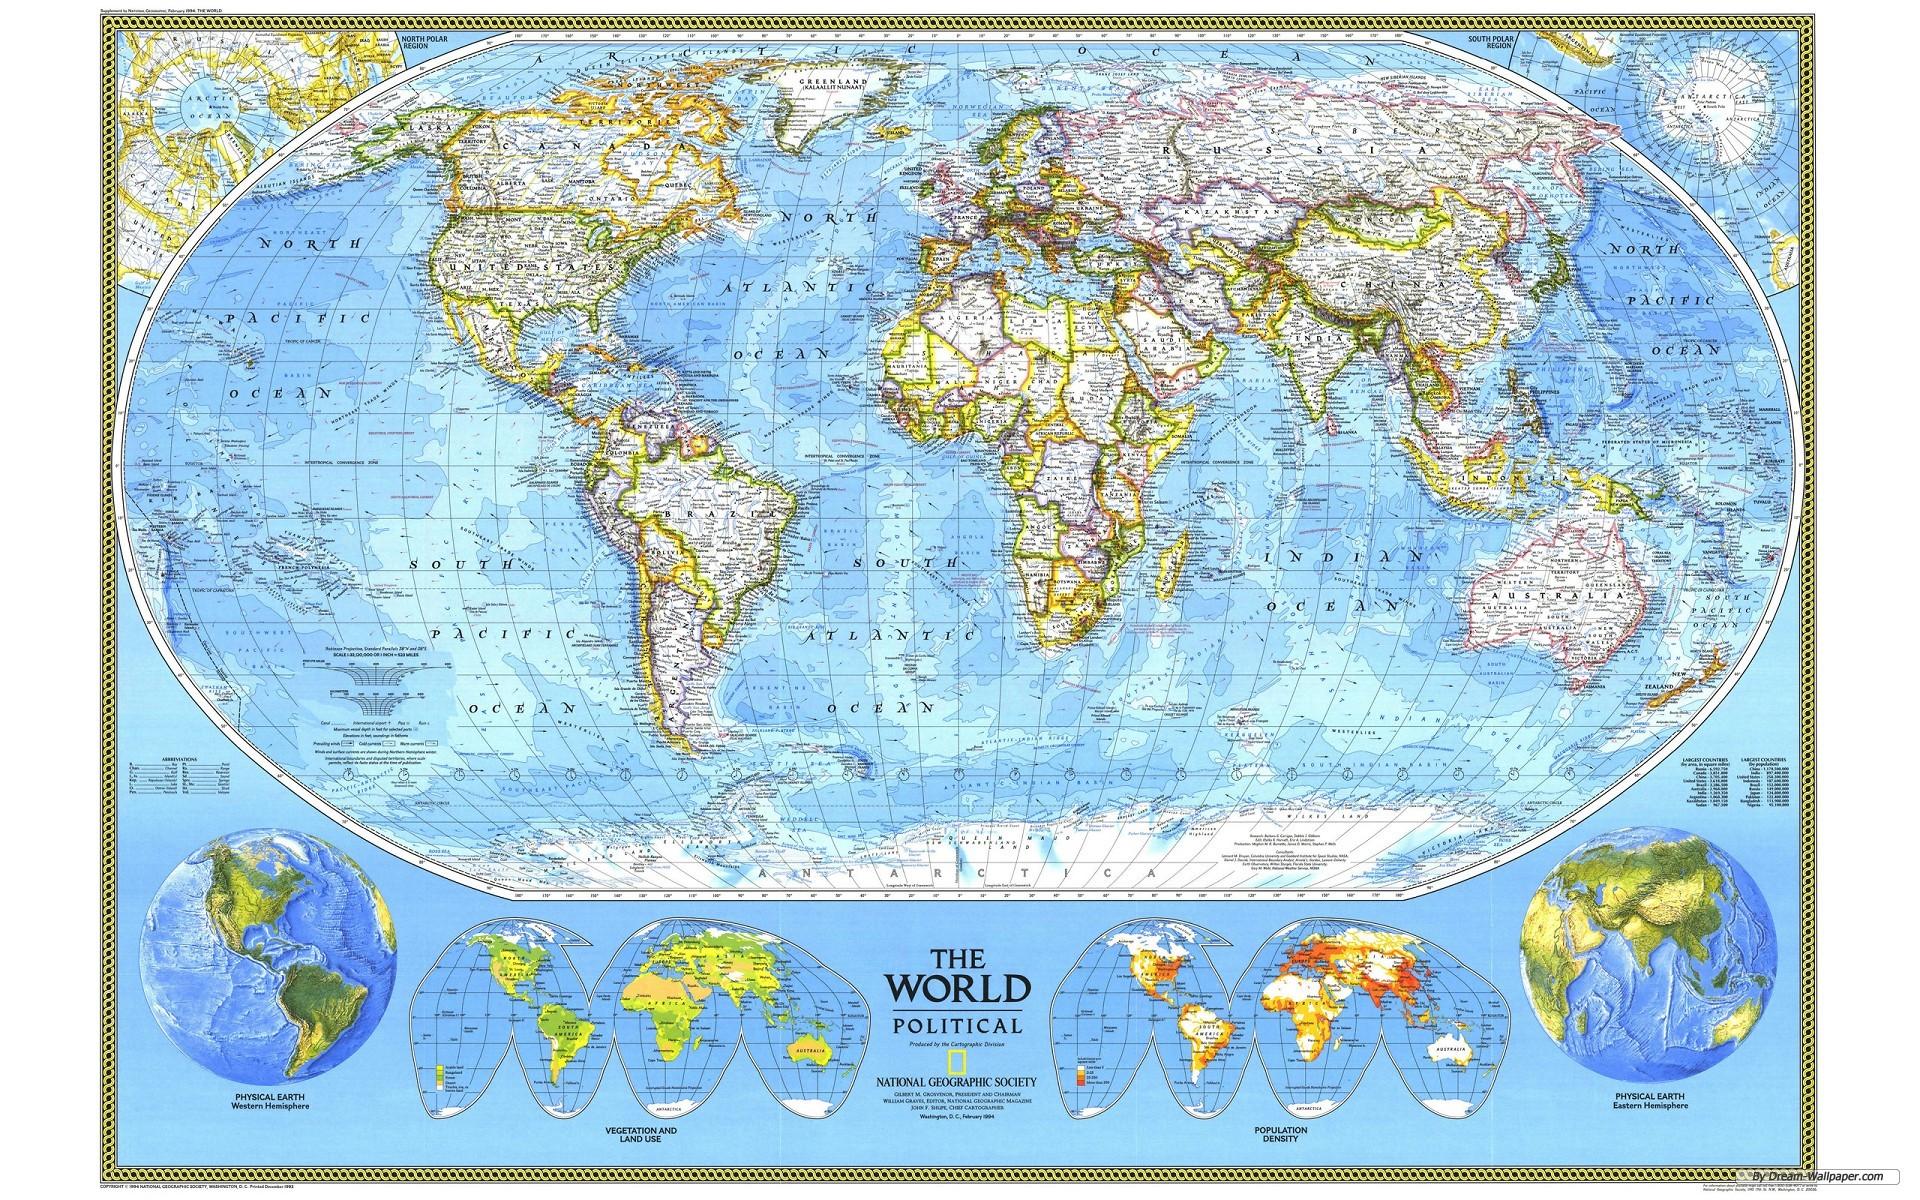 World map wallpaper desktop wallpapersafari wallpaper desktop wallpapers world travel 1920x1200 1920x1200 gumiabroncs Image collections